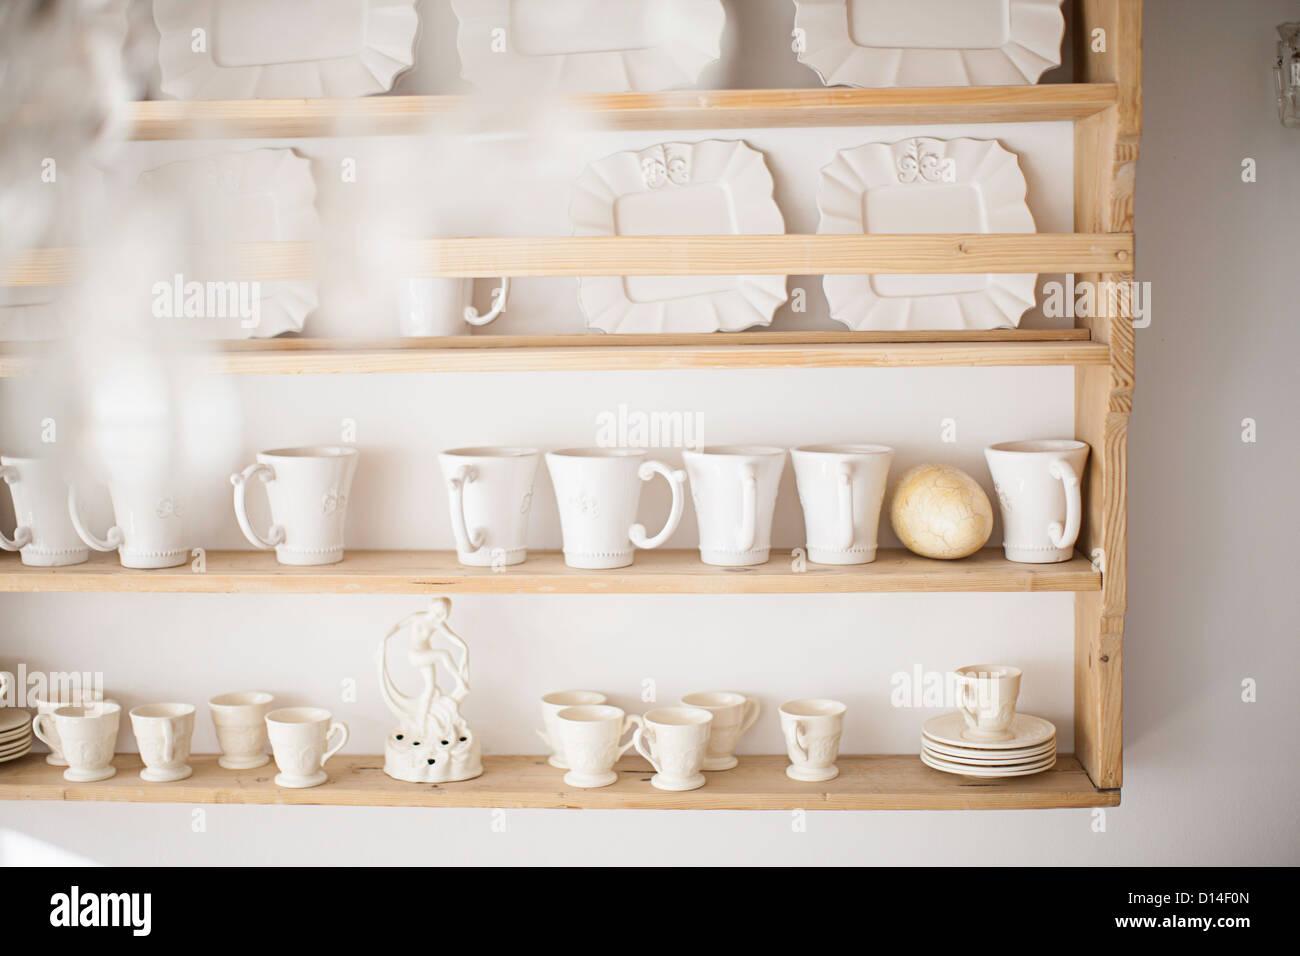 Milchkaffee Tassen Auf Kuchenregal Stockfoto Bild 52345349 Alamy